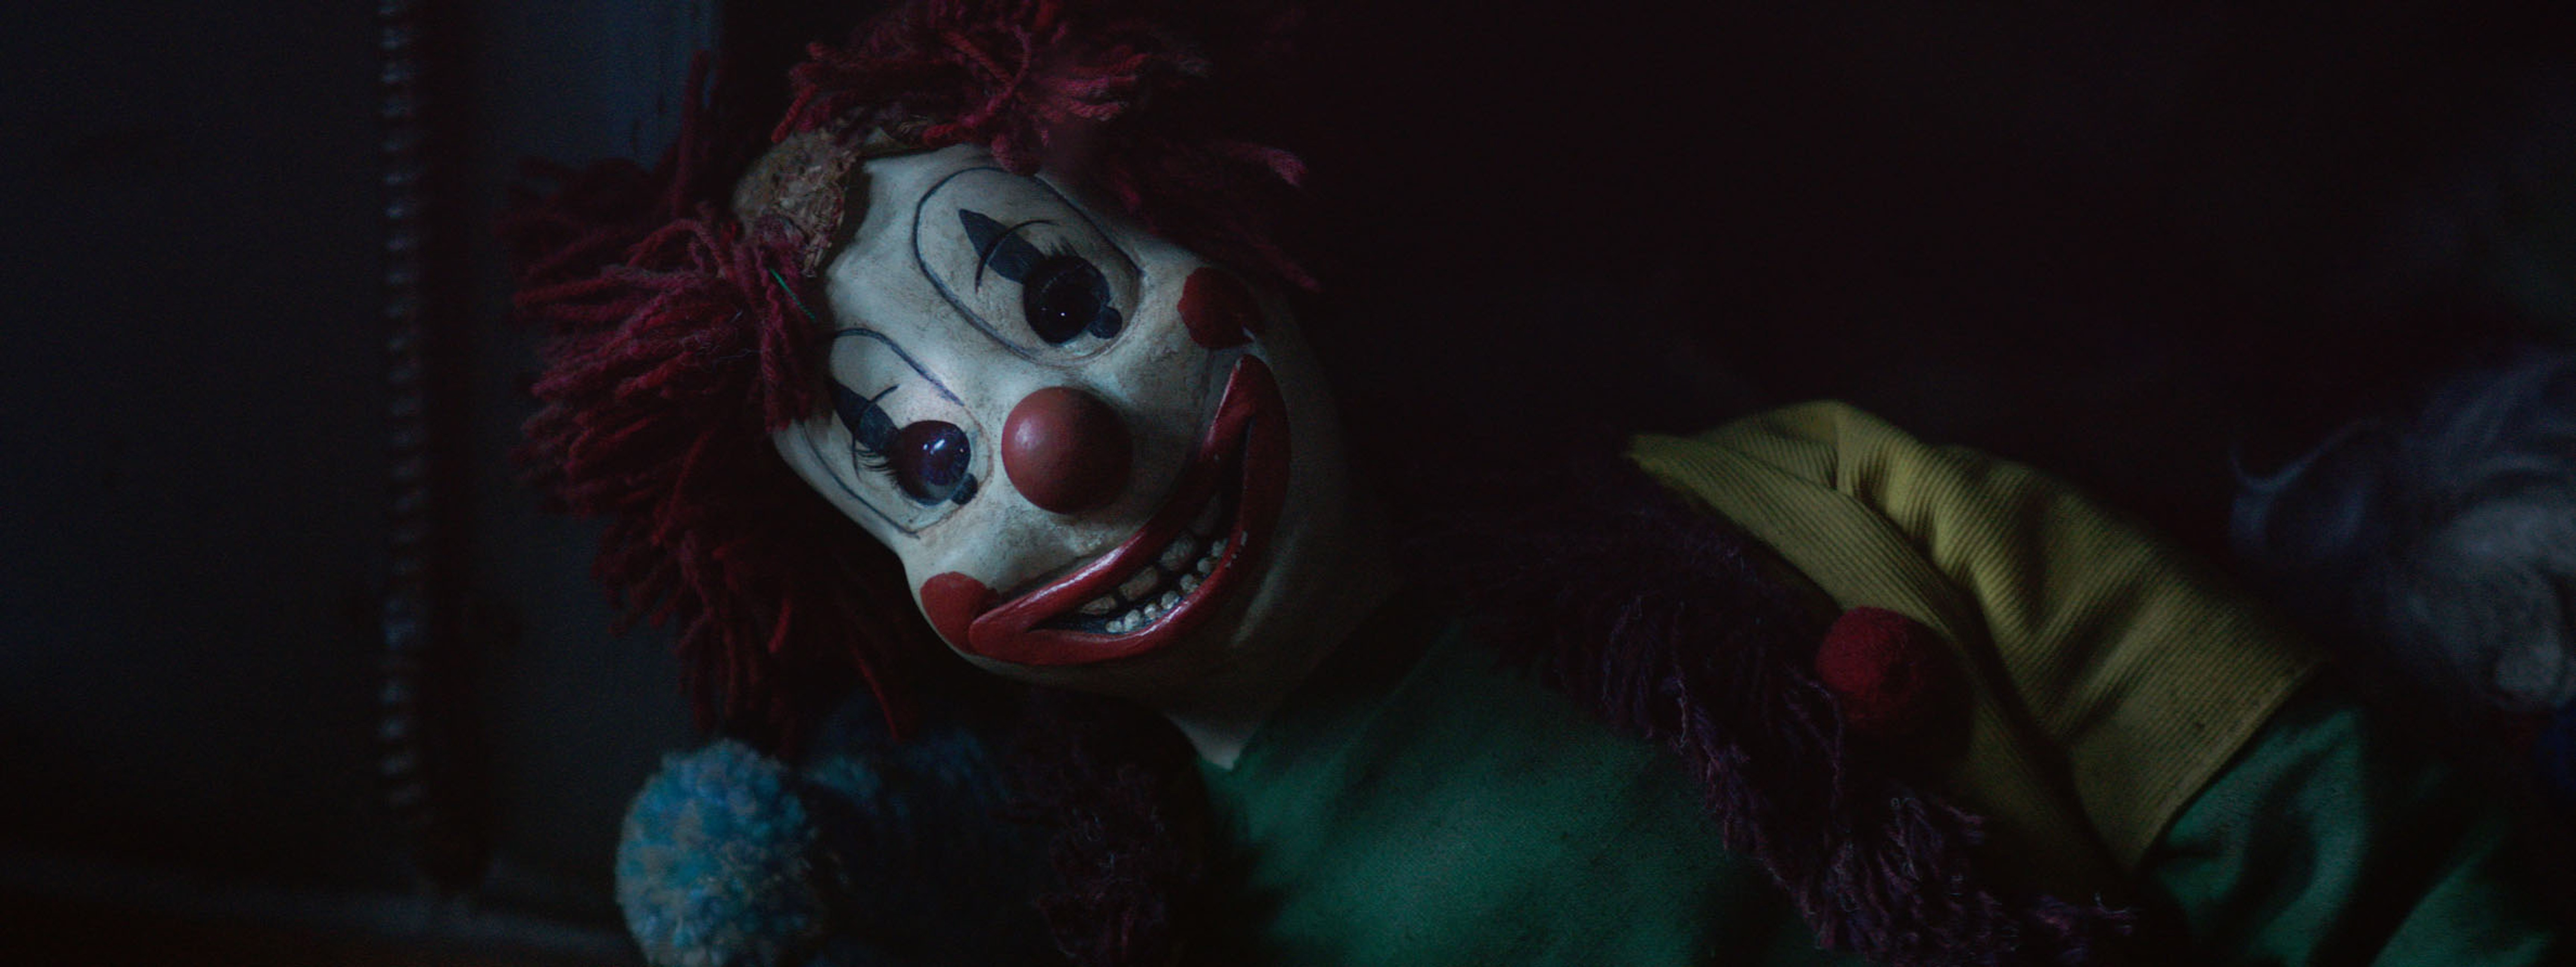 Wallpaper poltergeist best movies of 2015 movie clown for Wallpaper home film